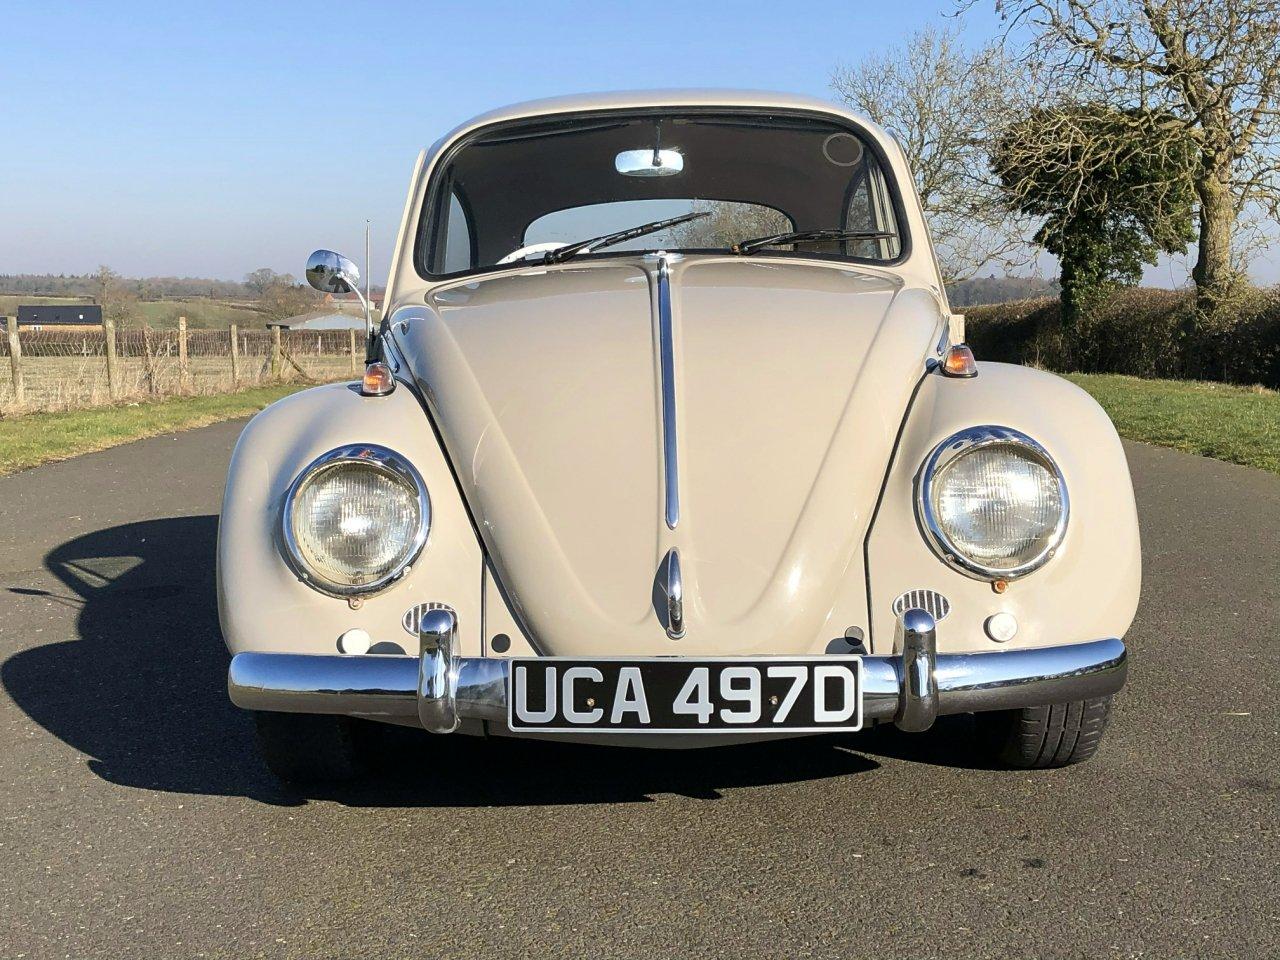 1966 Volkswagen Beetle 1600cc SOLD (picture 2 of 6)